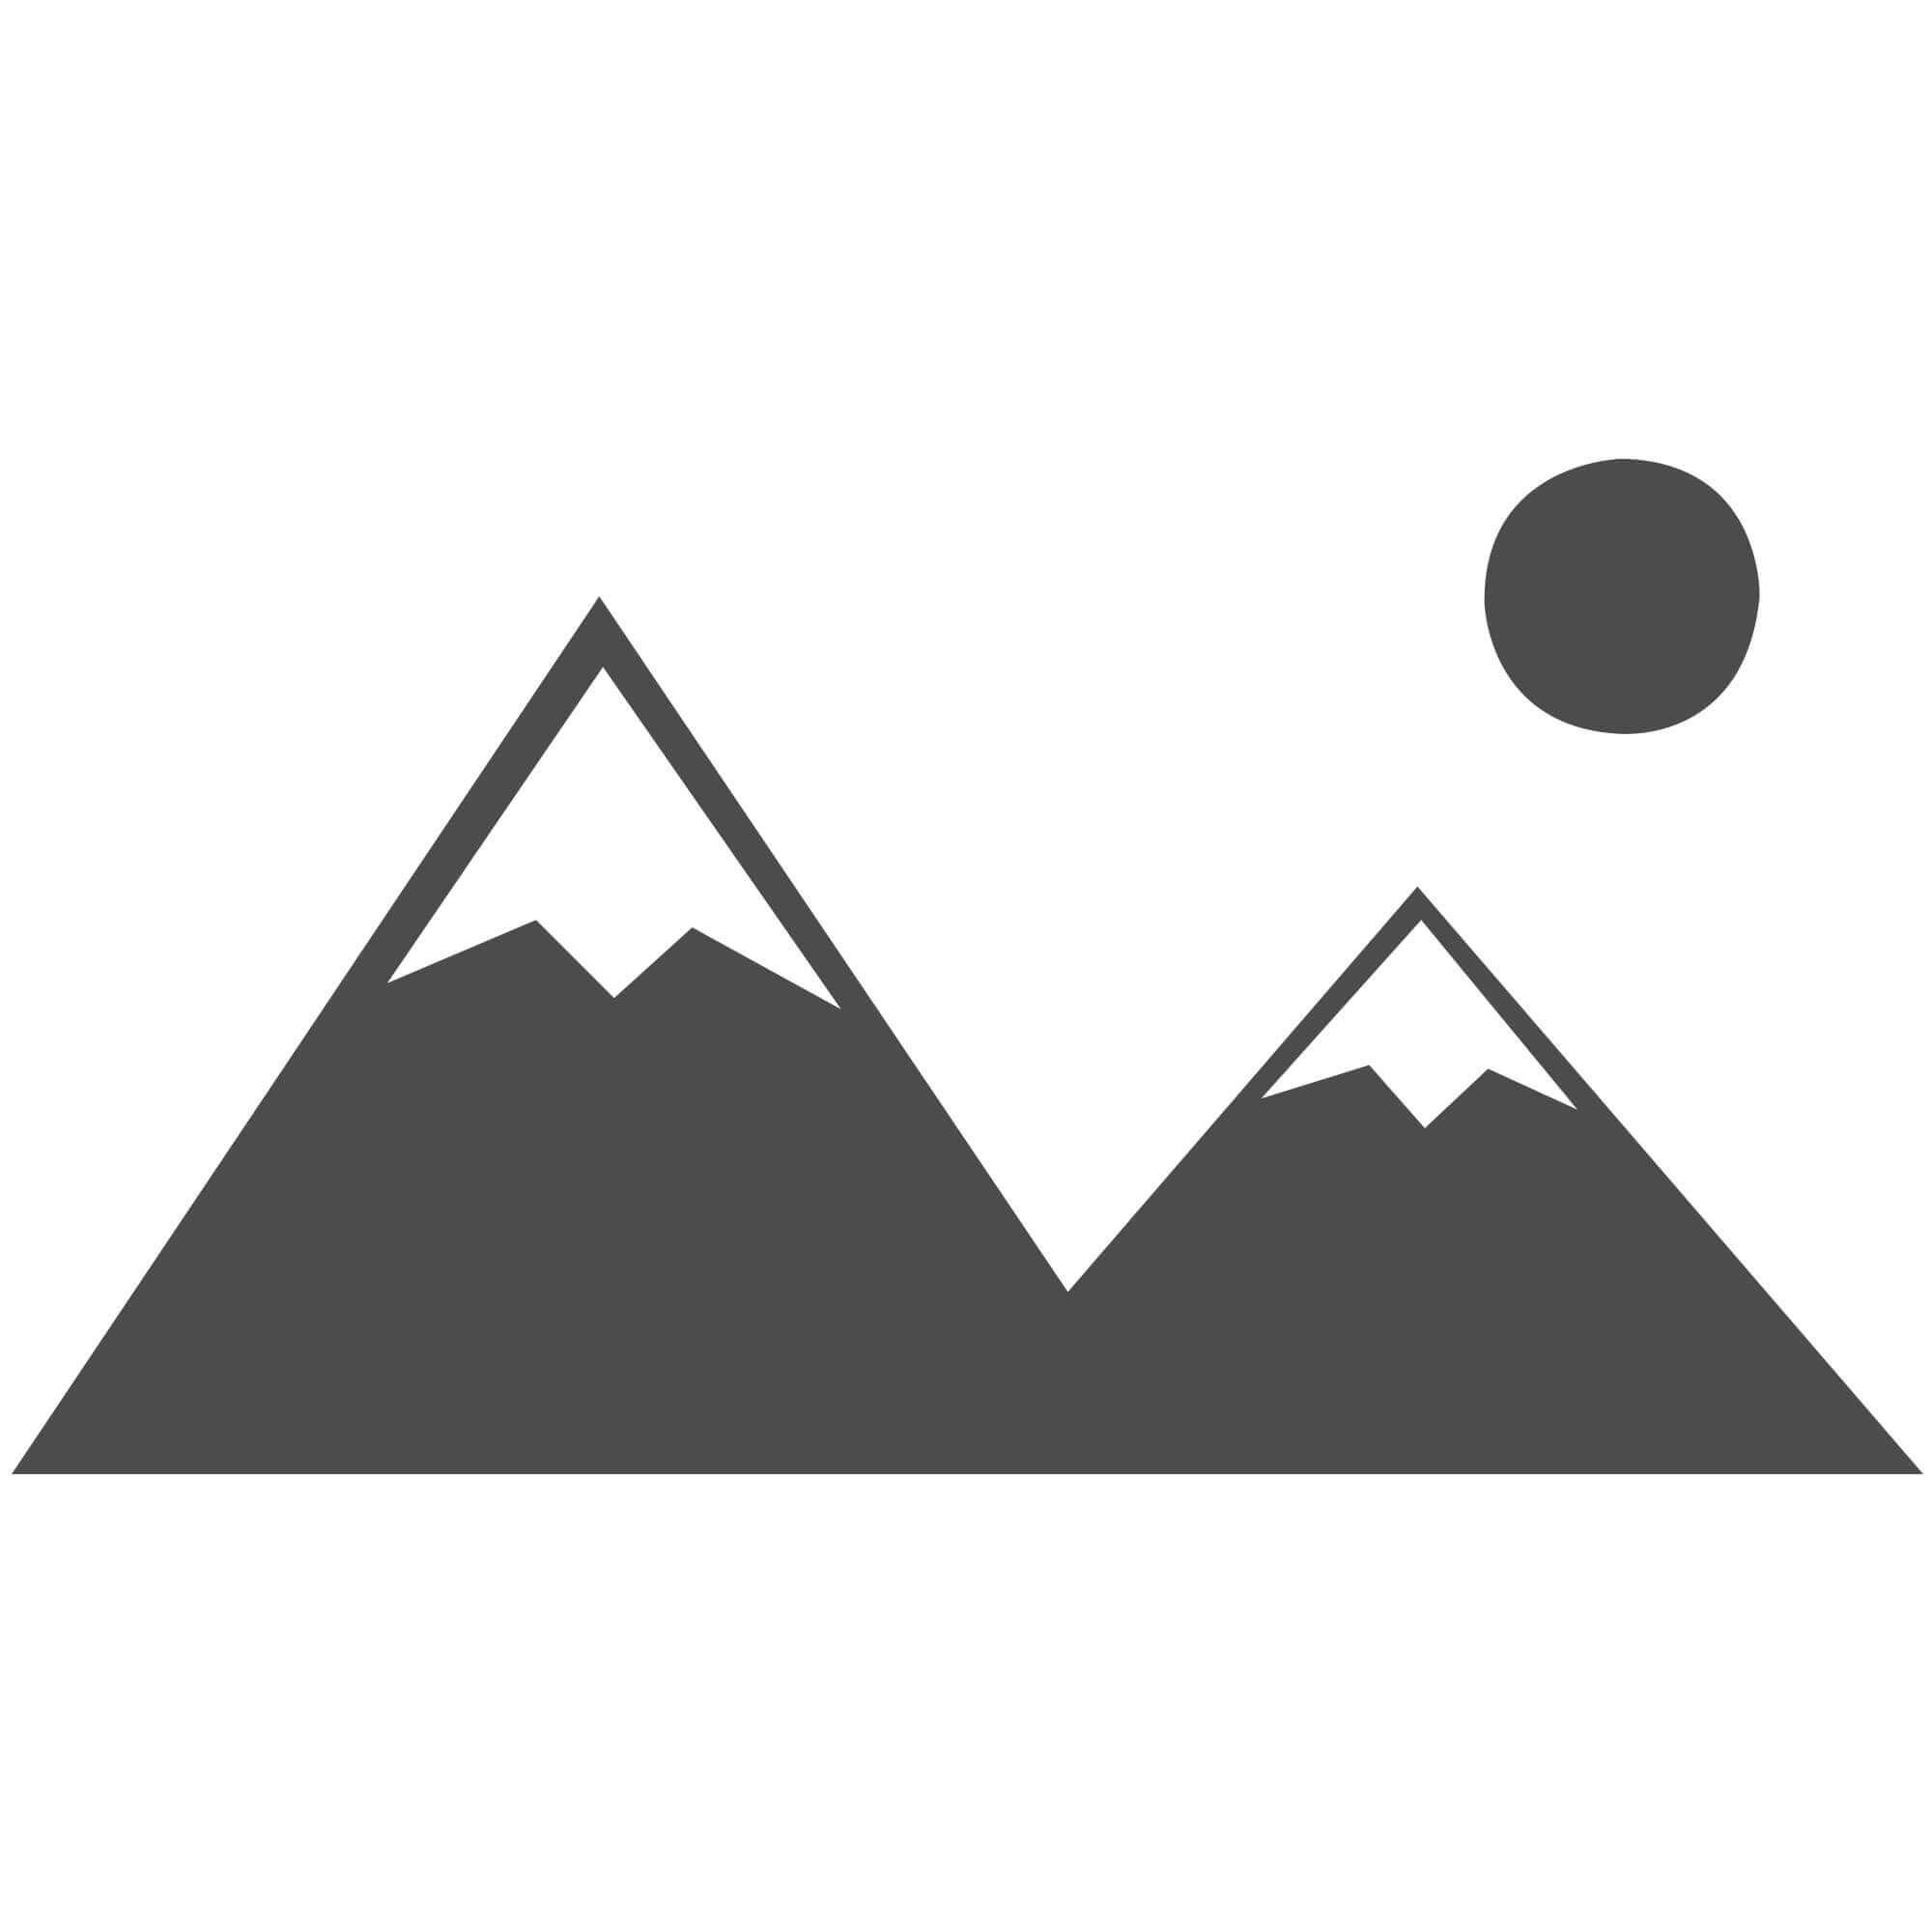 "Griot Stripe Rug - Kalimba - KI804 Clove-76 x 122 cm (2'6"" x 4')"